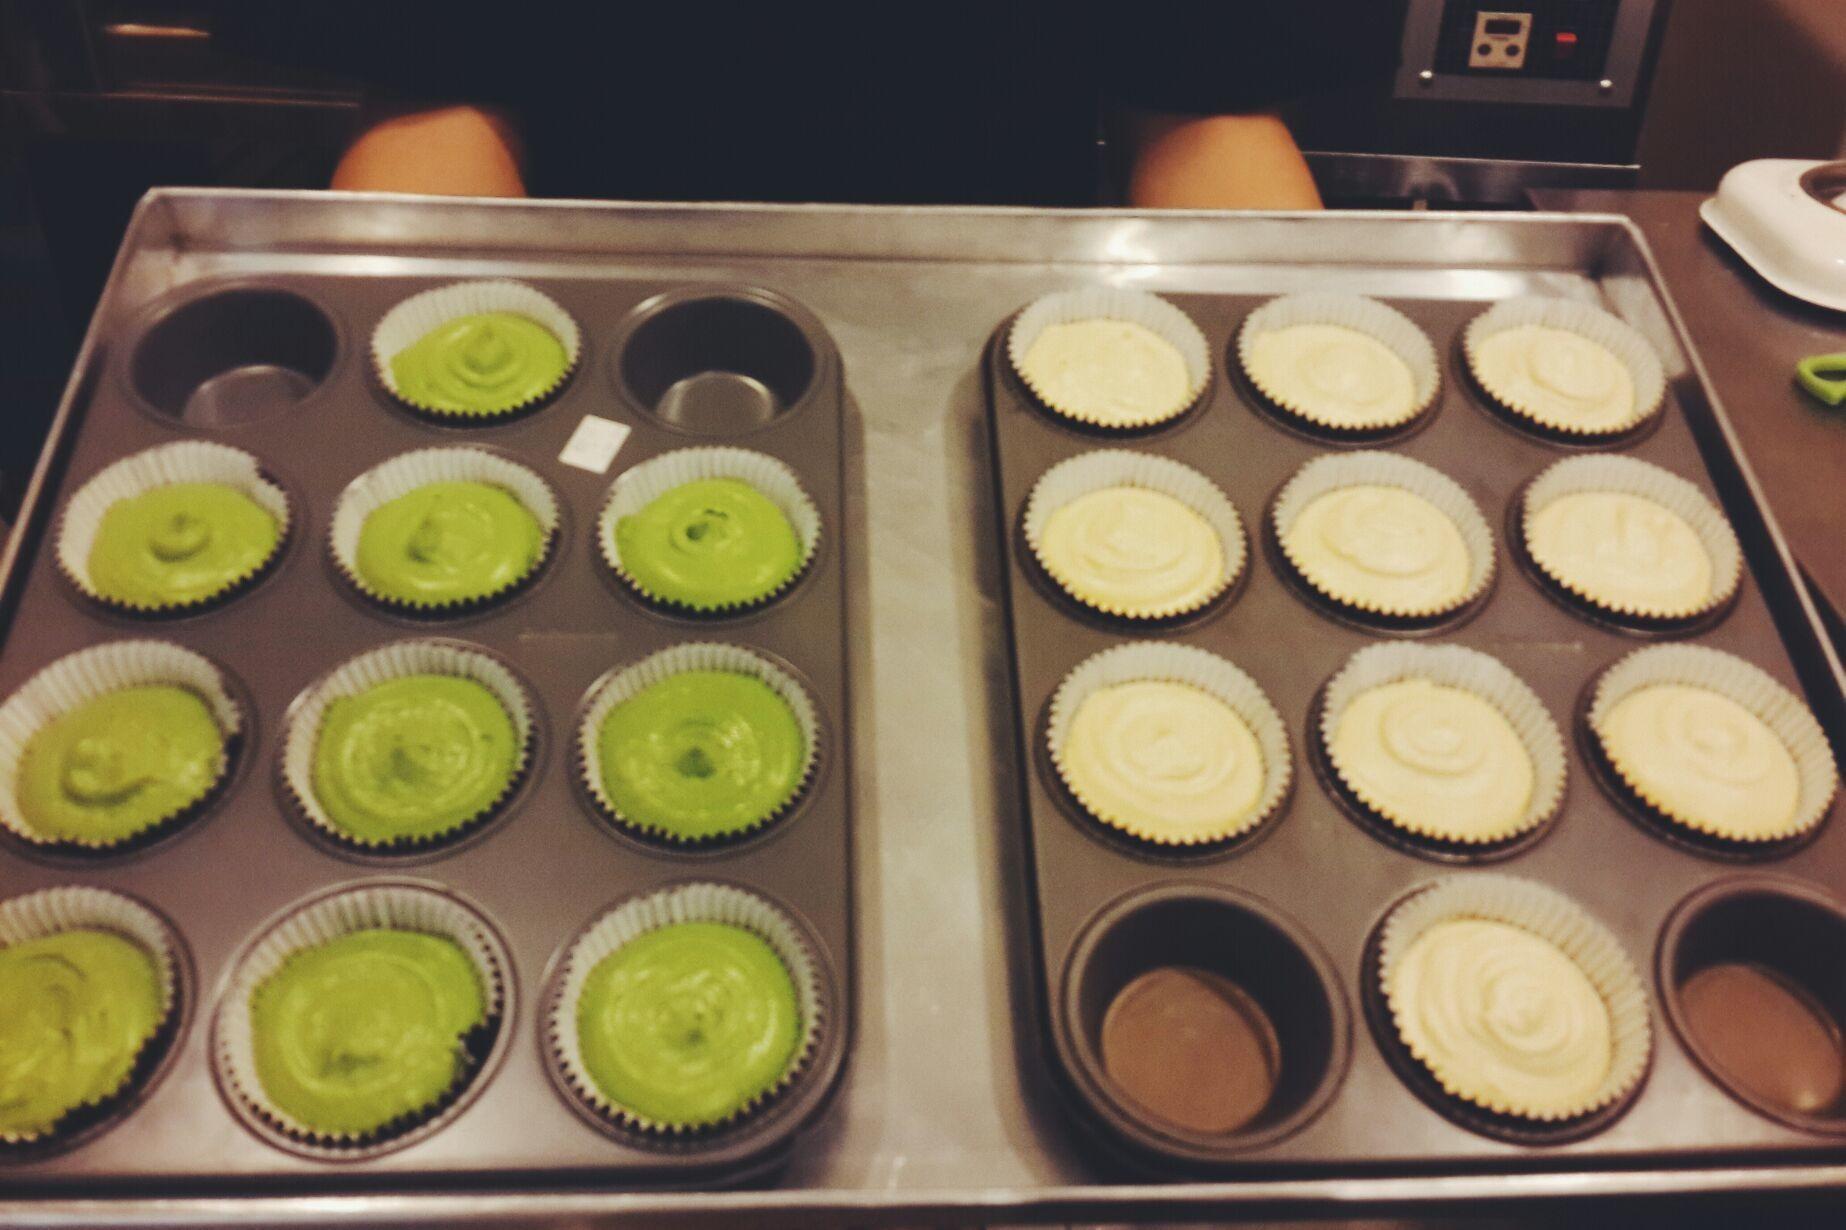 Greentea and vanilla cupcakes dough. Can't wait!